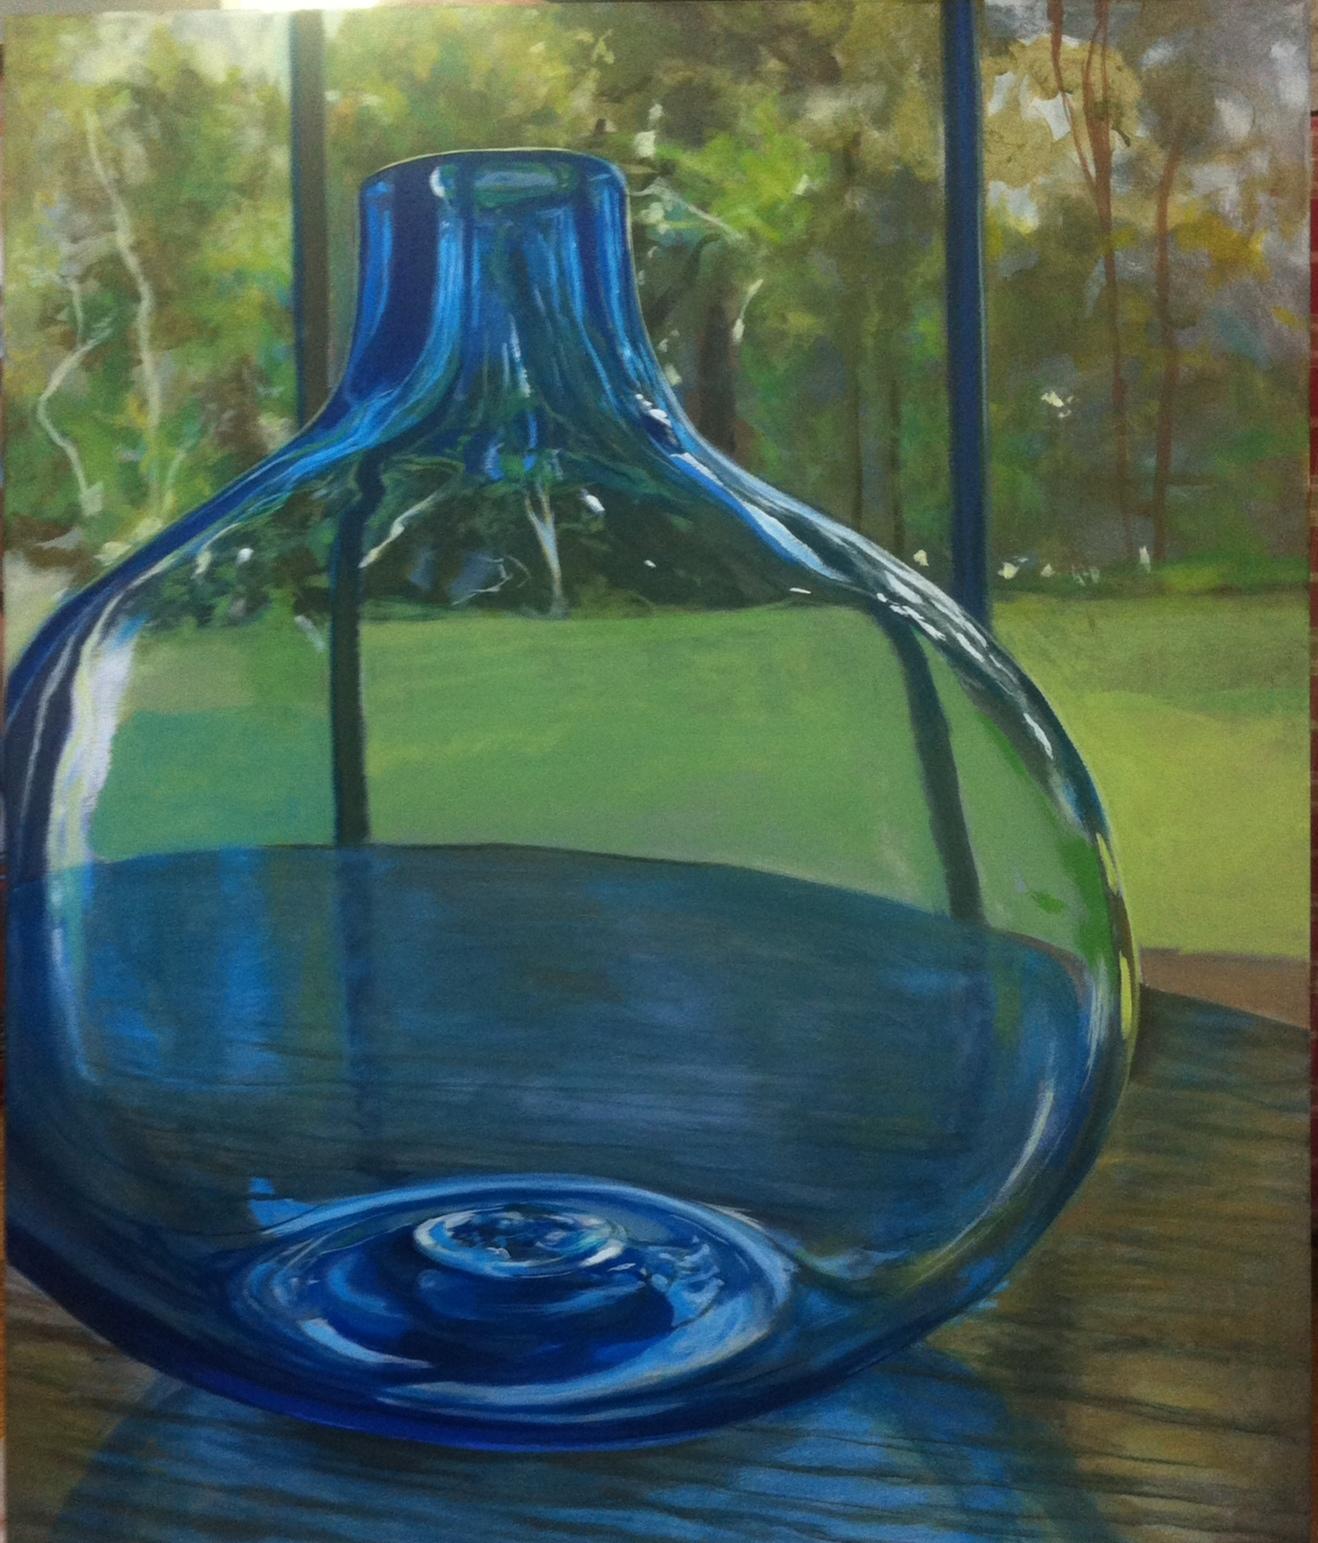 Chatham Glass